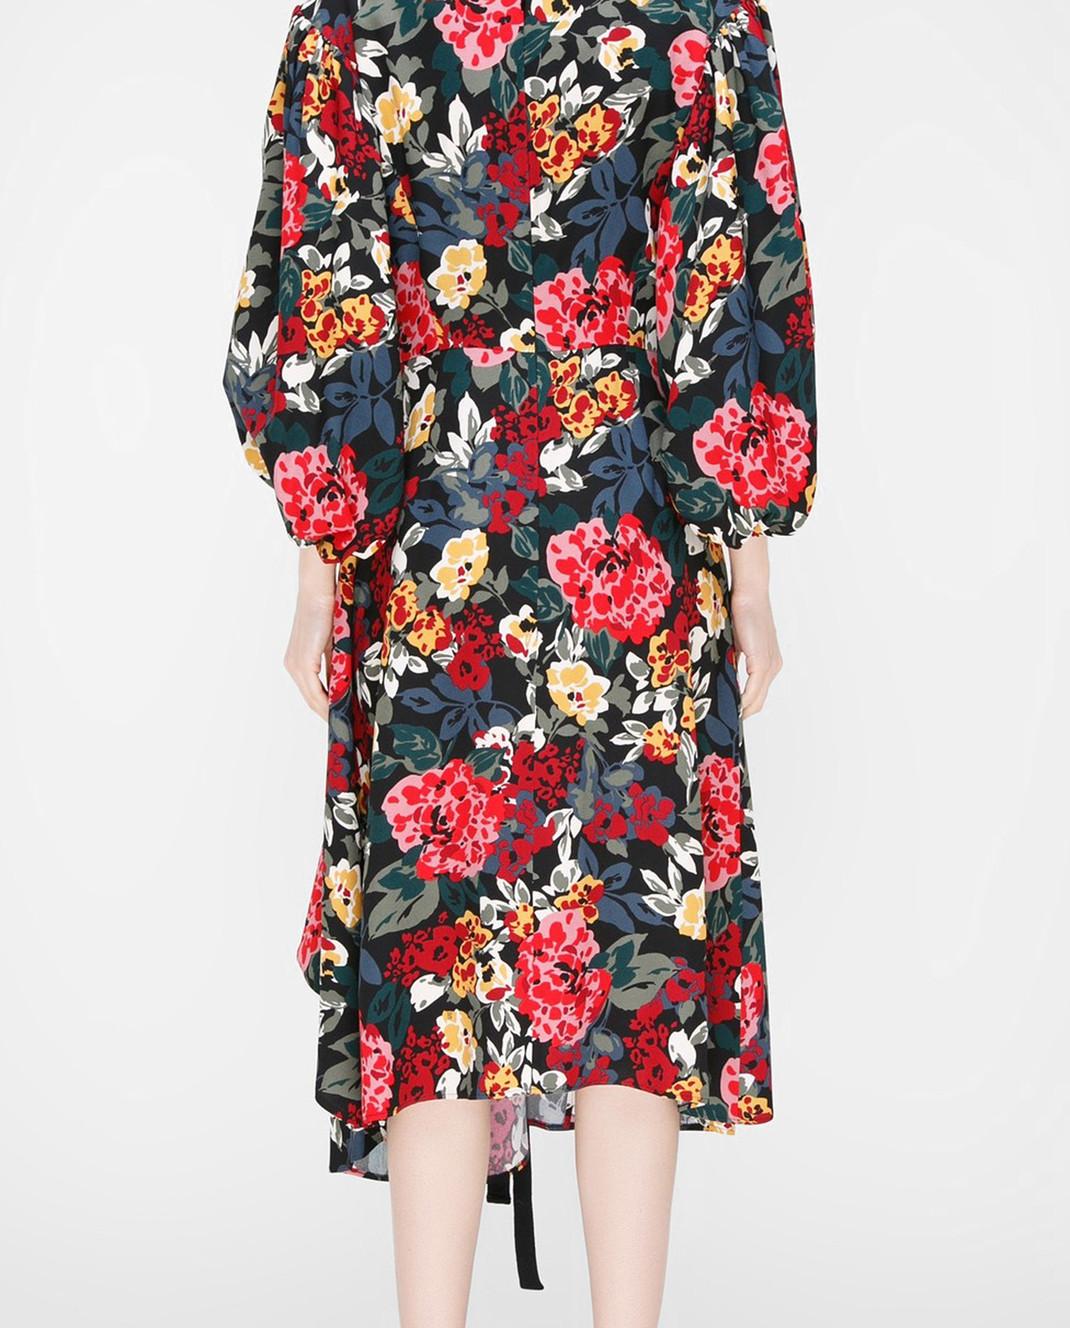 Sonia Rykiel Платье 17432403 изображение 4